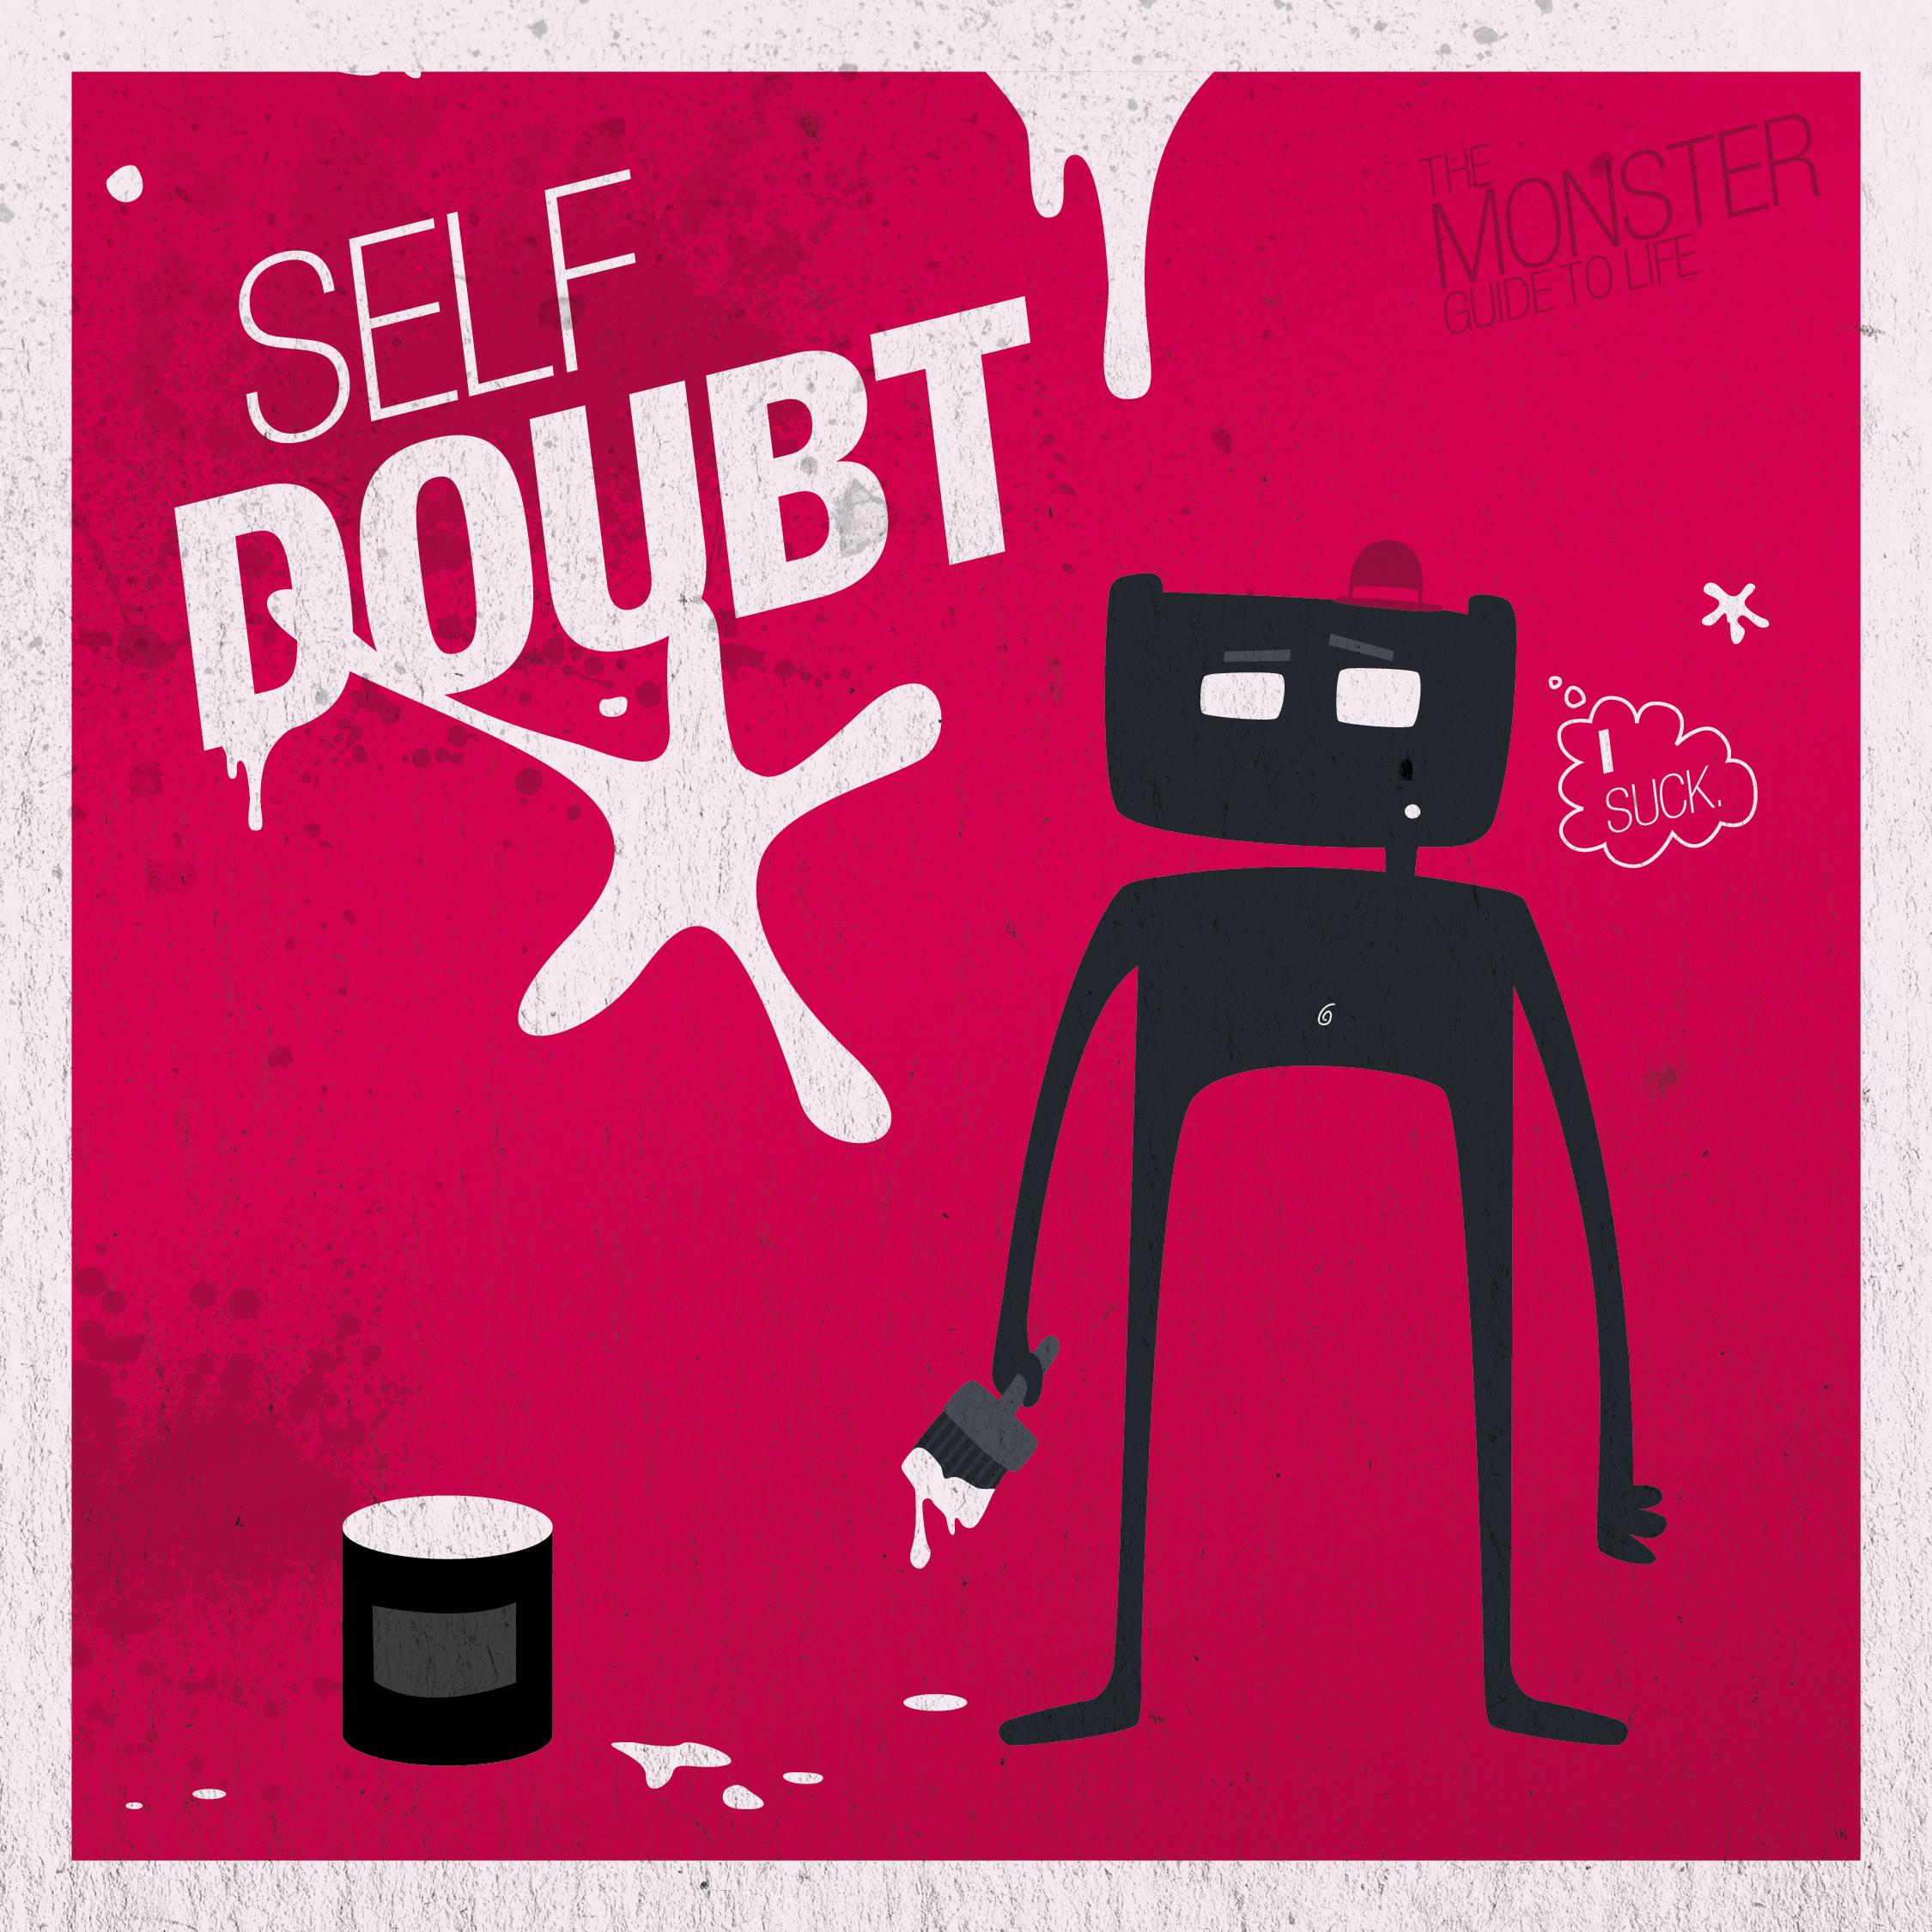 Self-doubt illustration